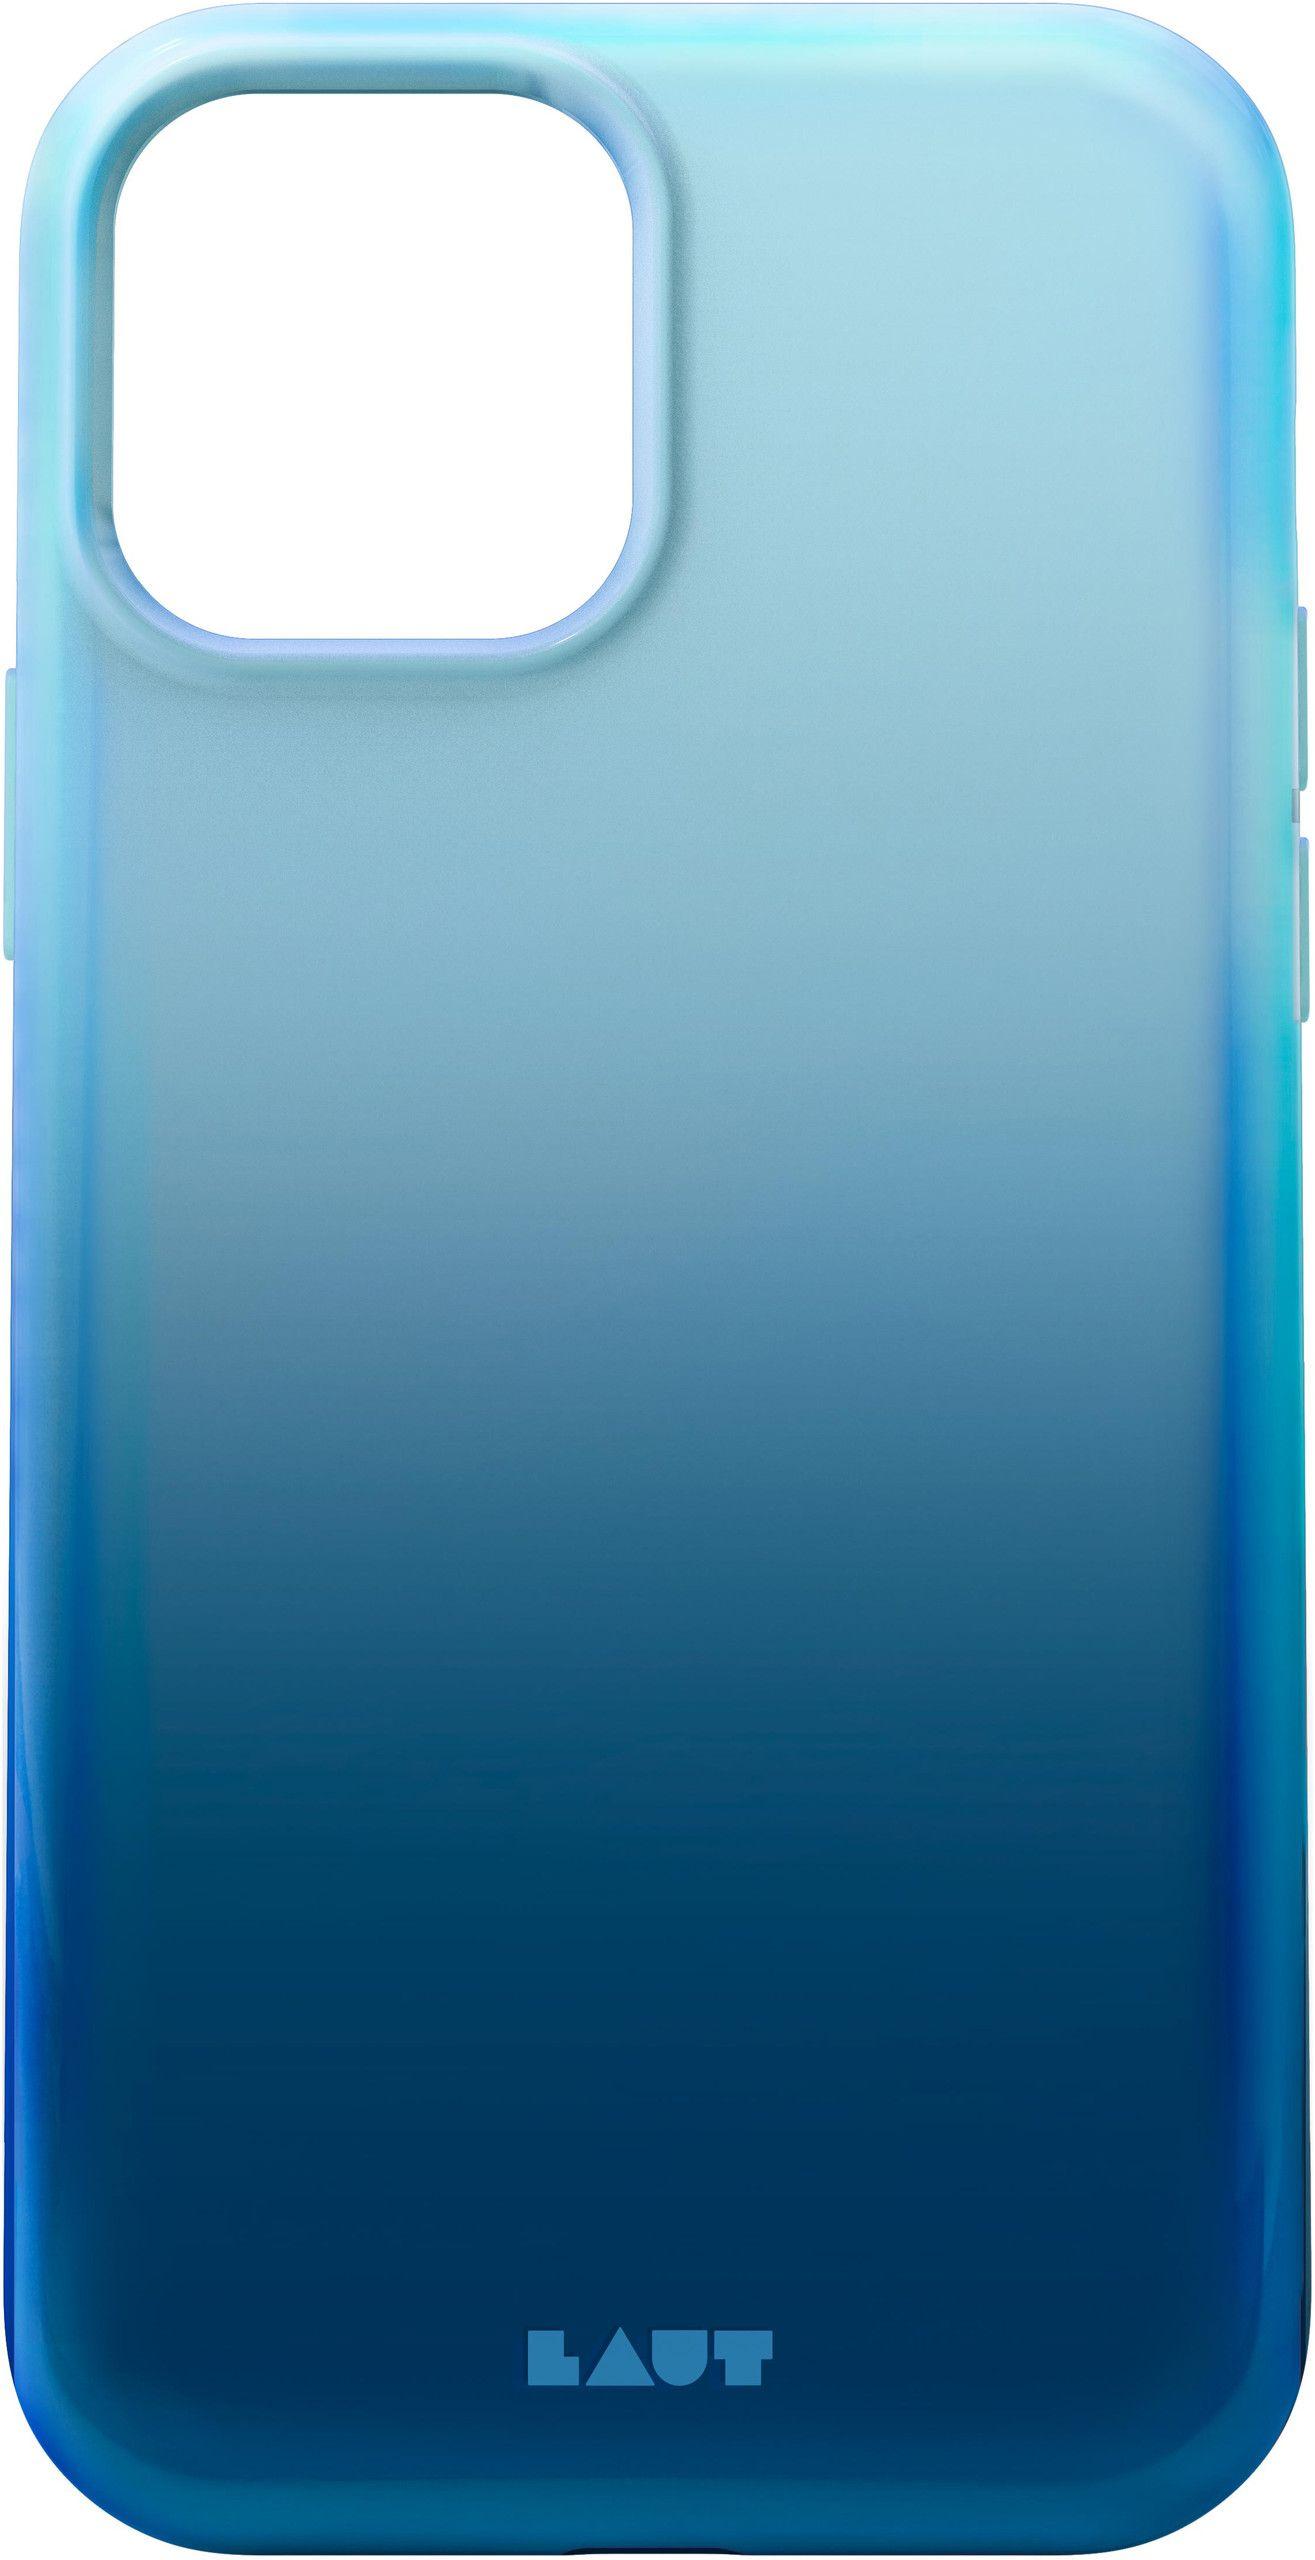 Laut Huex Fade (iPhone 12 mini) - Blå